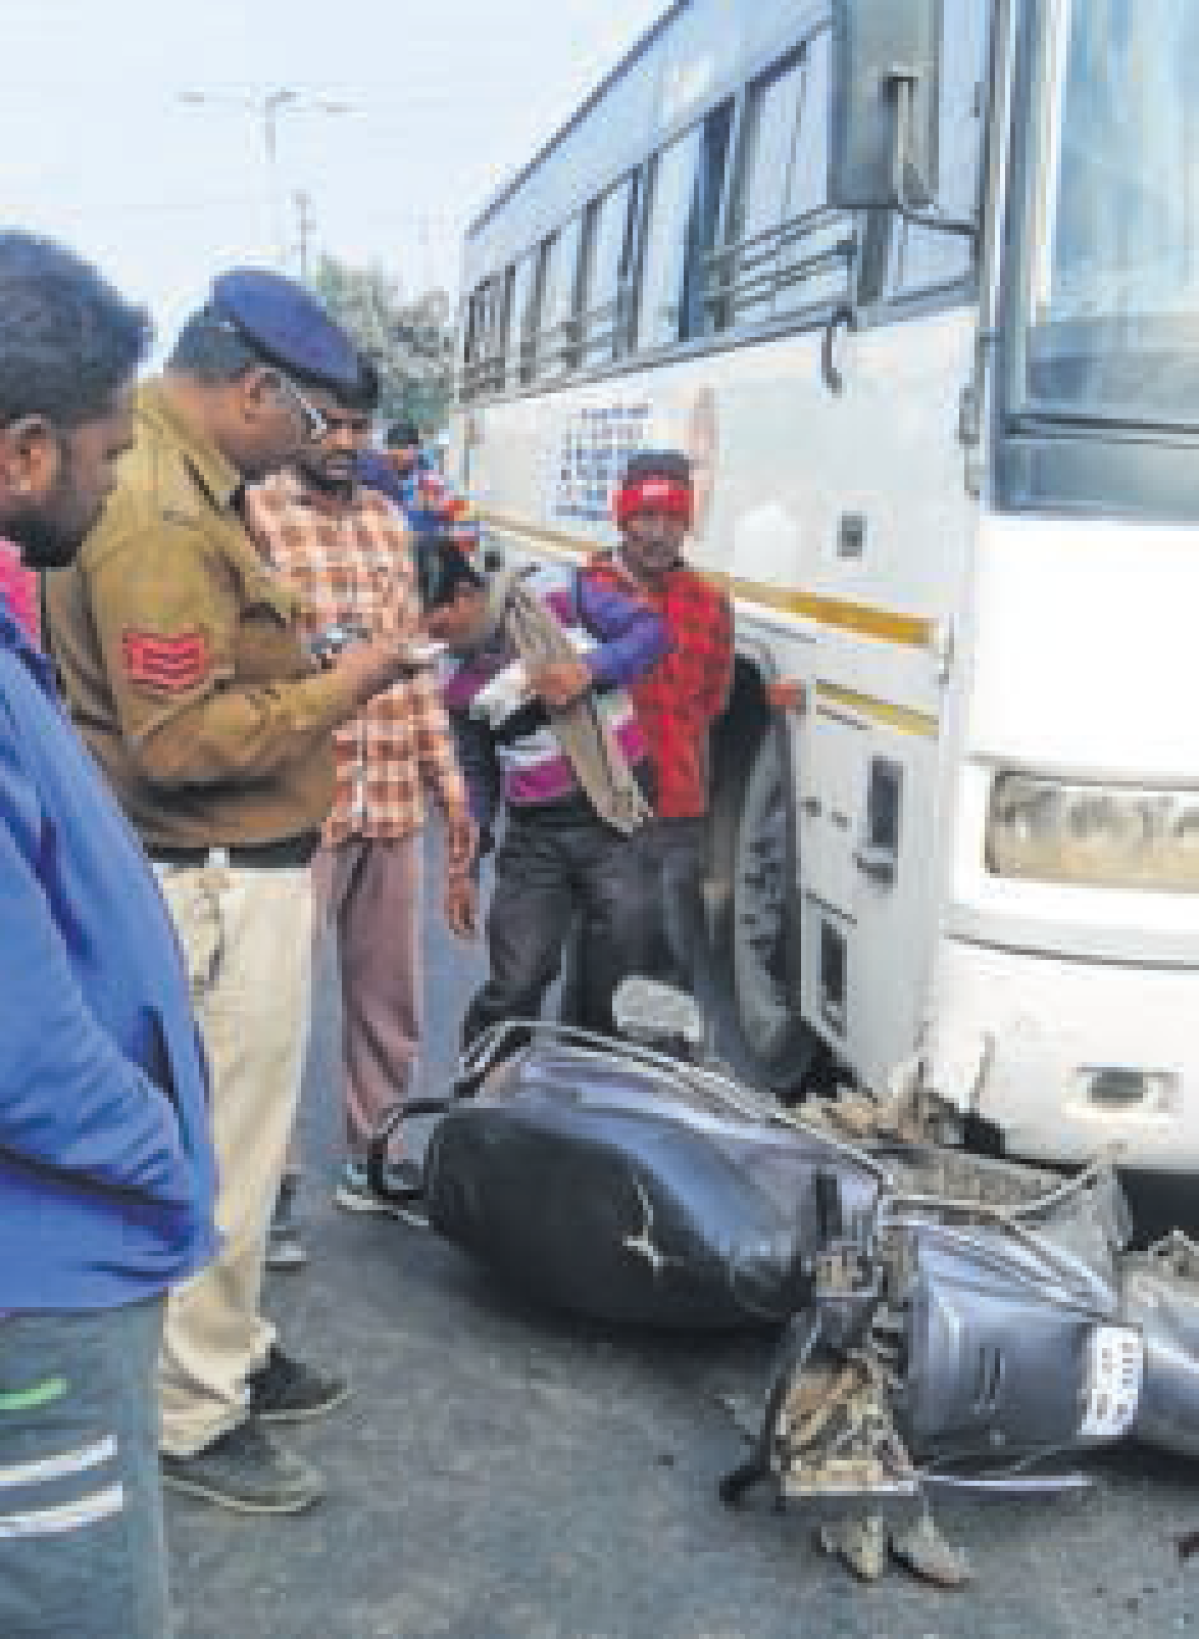 Ujjain: Bus hits 2-wheeler, 2 hurt